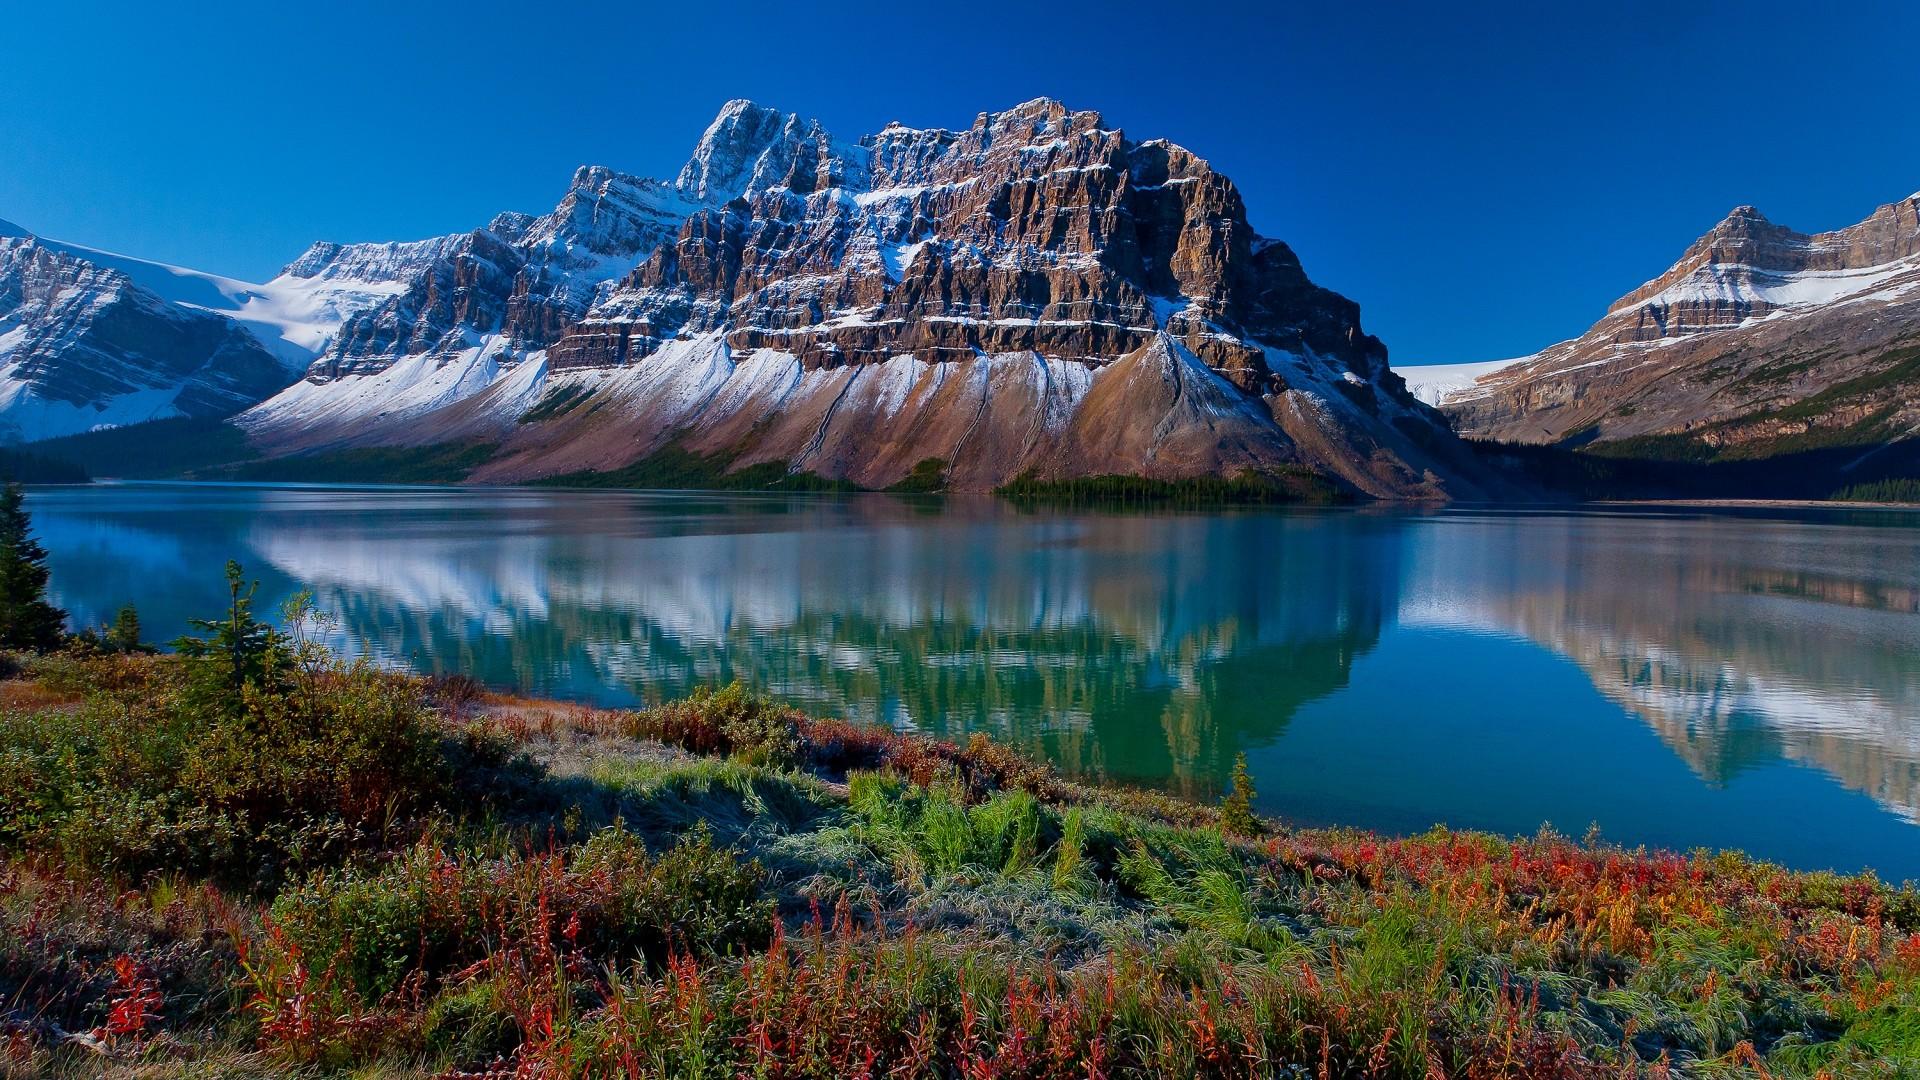 … Background Full HD 1080p. Wallpaper mountains, nature, river,  grass, beautiful landscape